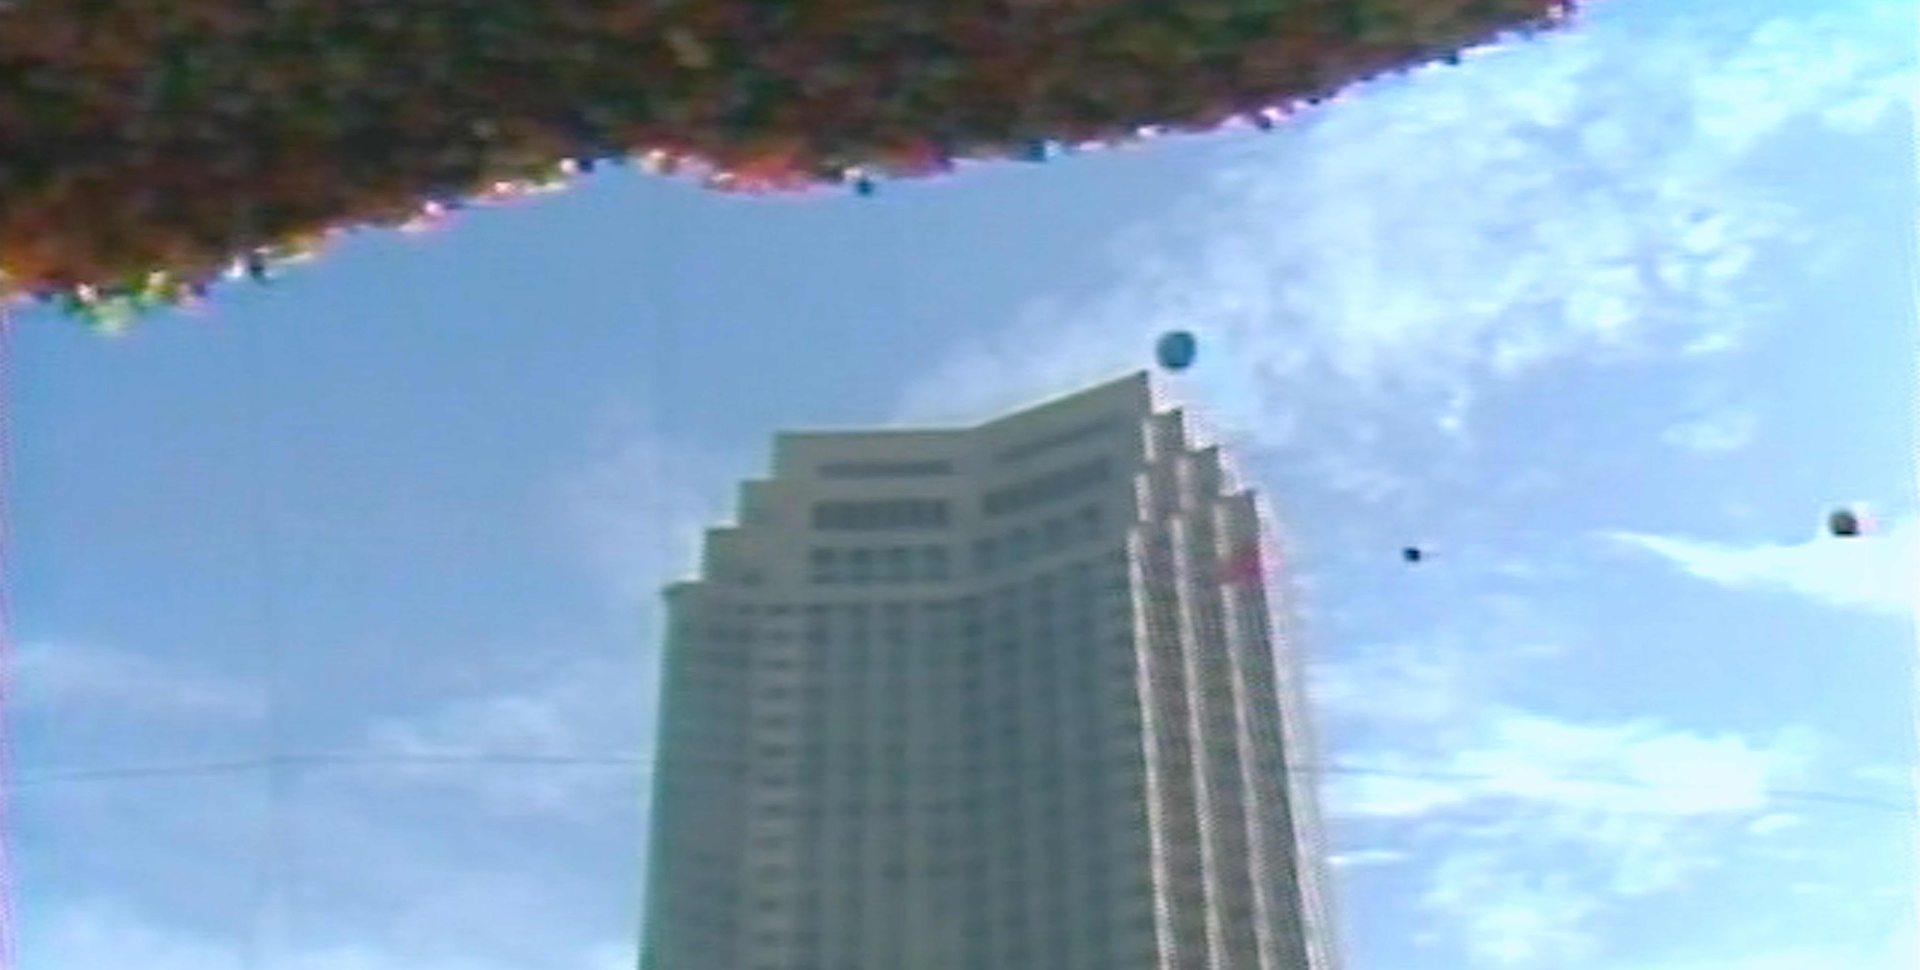 https://mdfilmfest.com/wp-content/uploads/BalloonFest_web.jpg